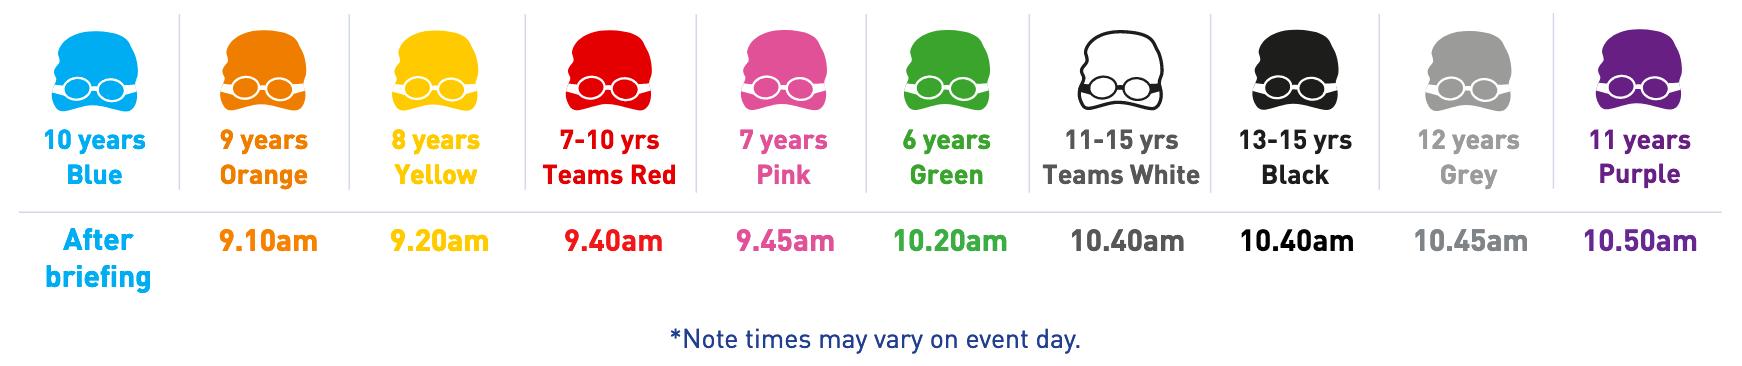 Rotorua Swim Times